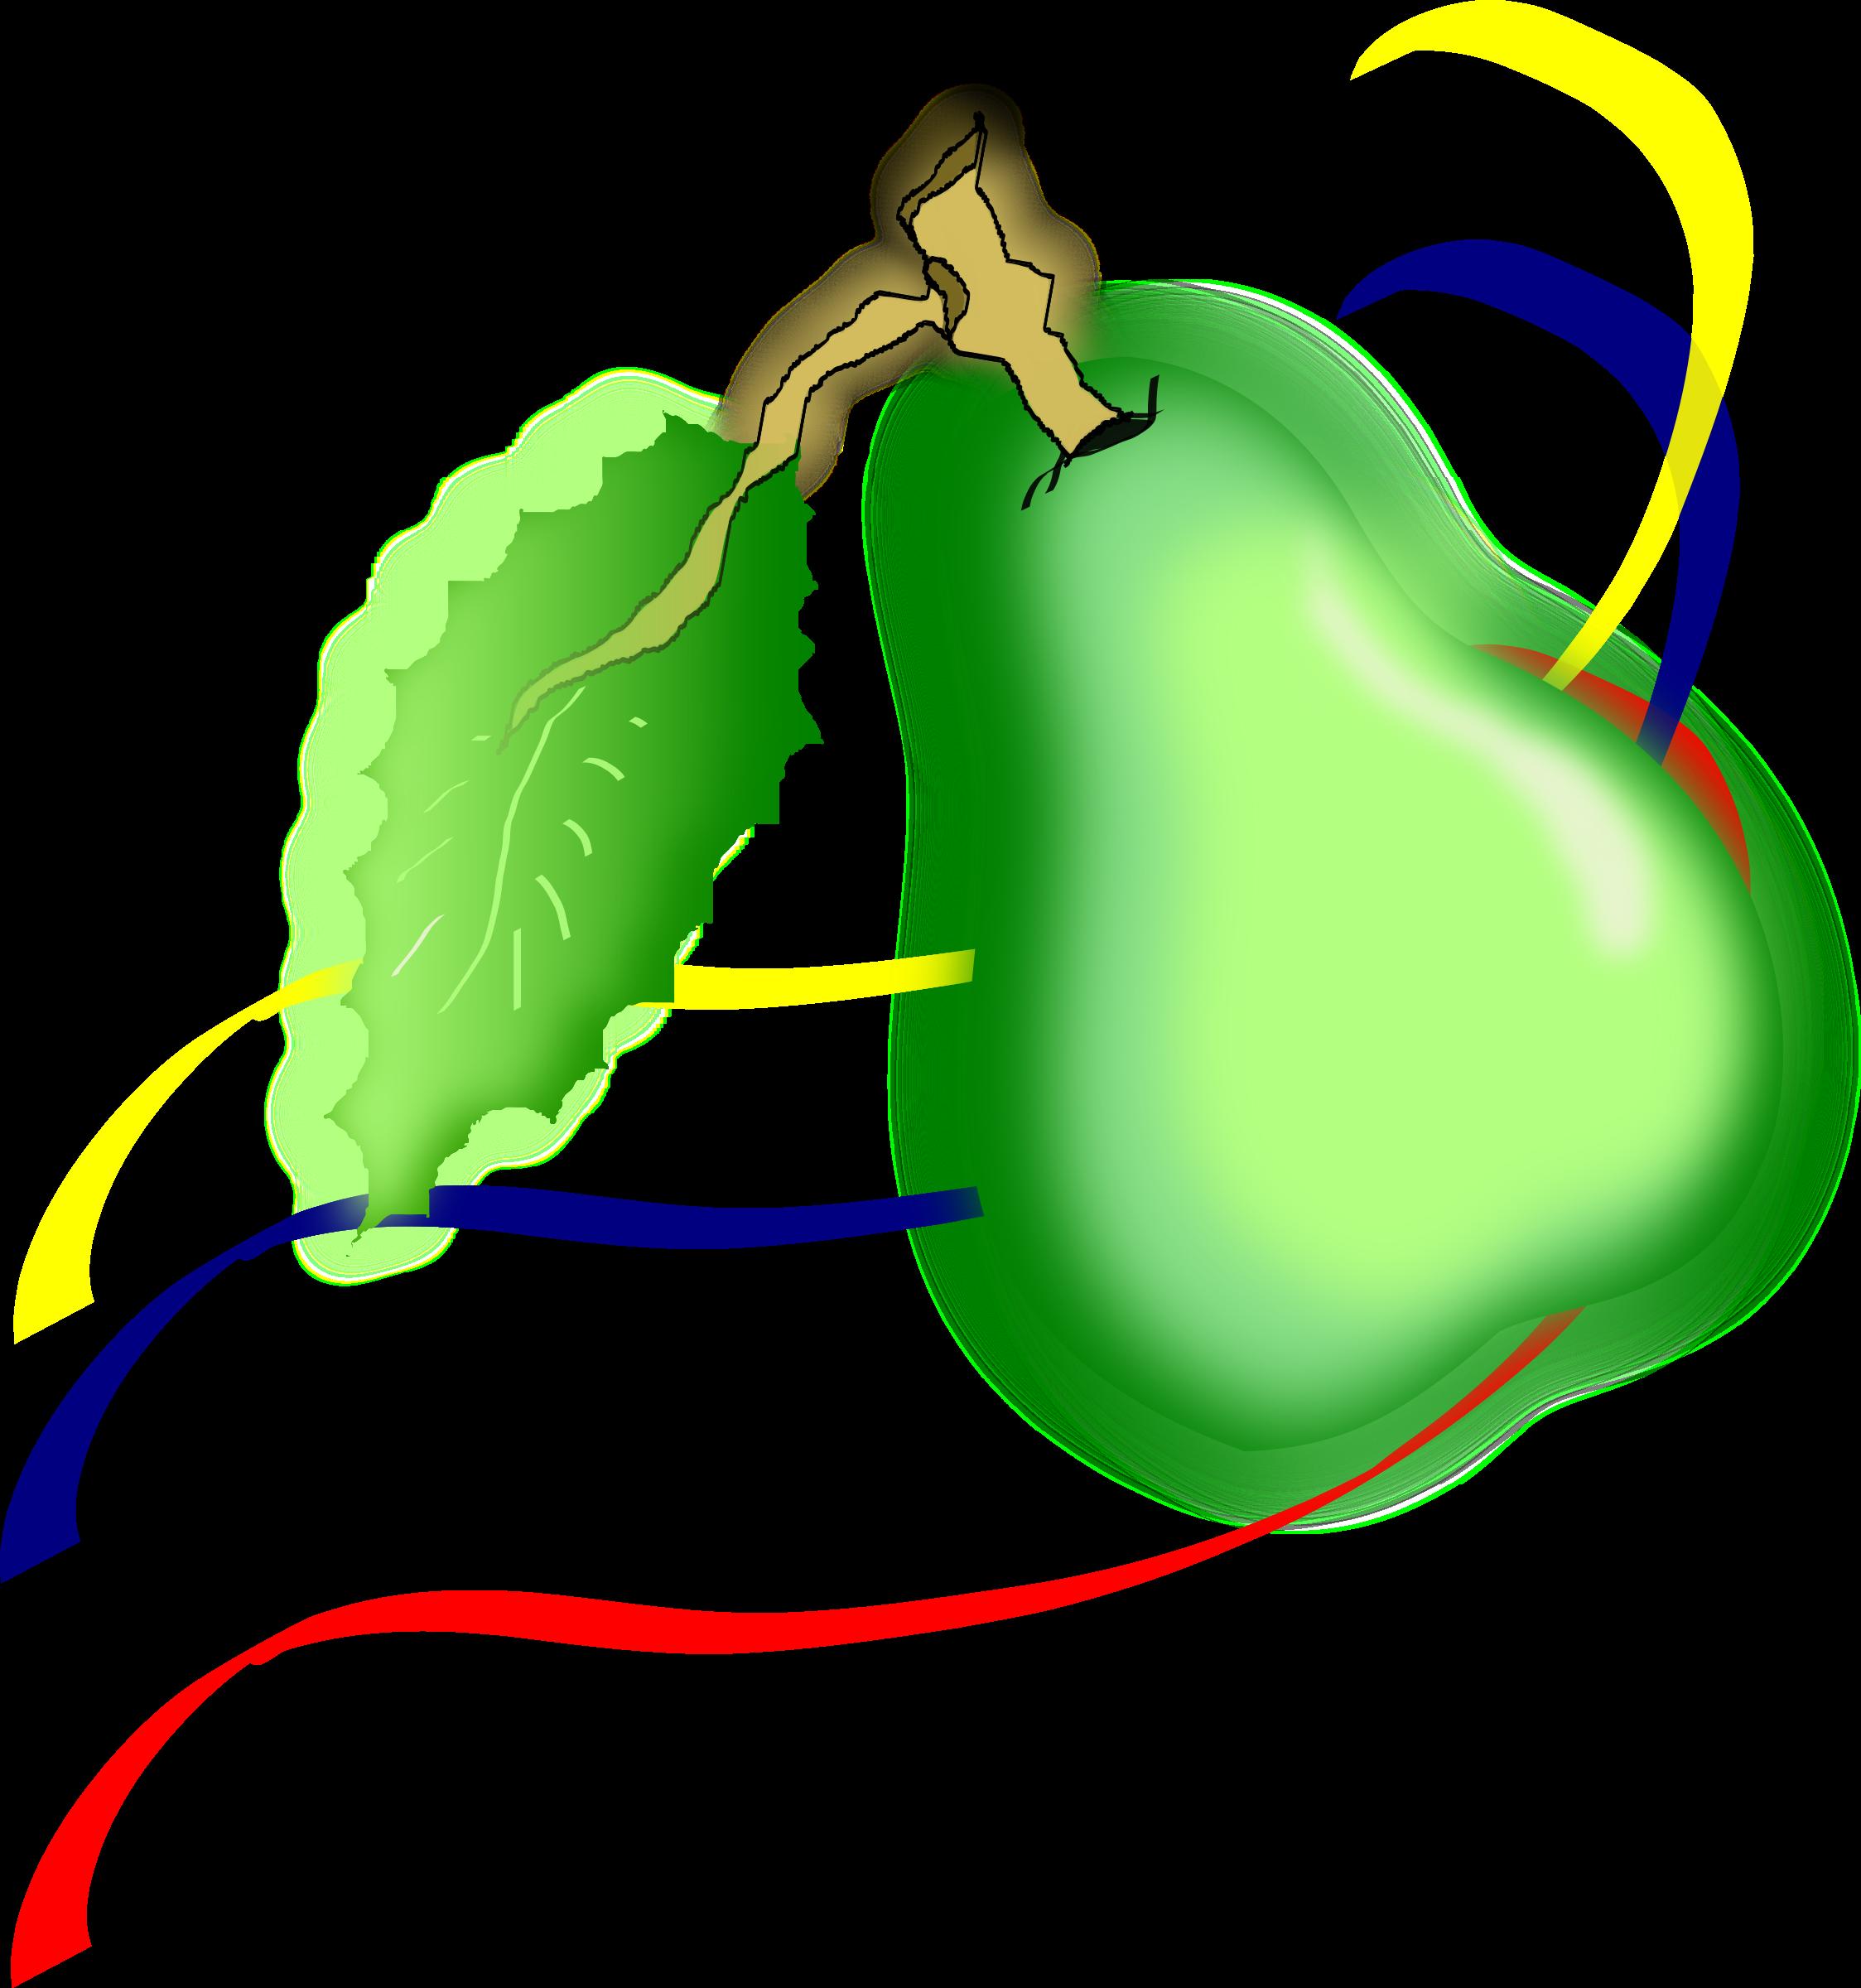 Pear clipart pera. Colombiana big image png